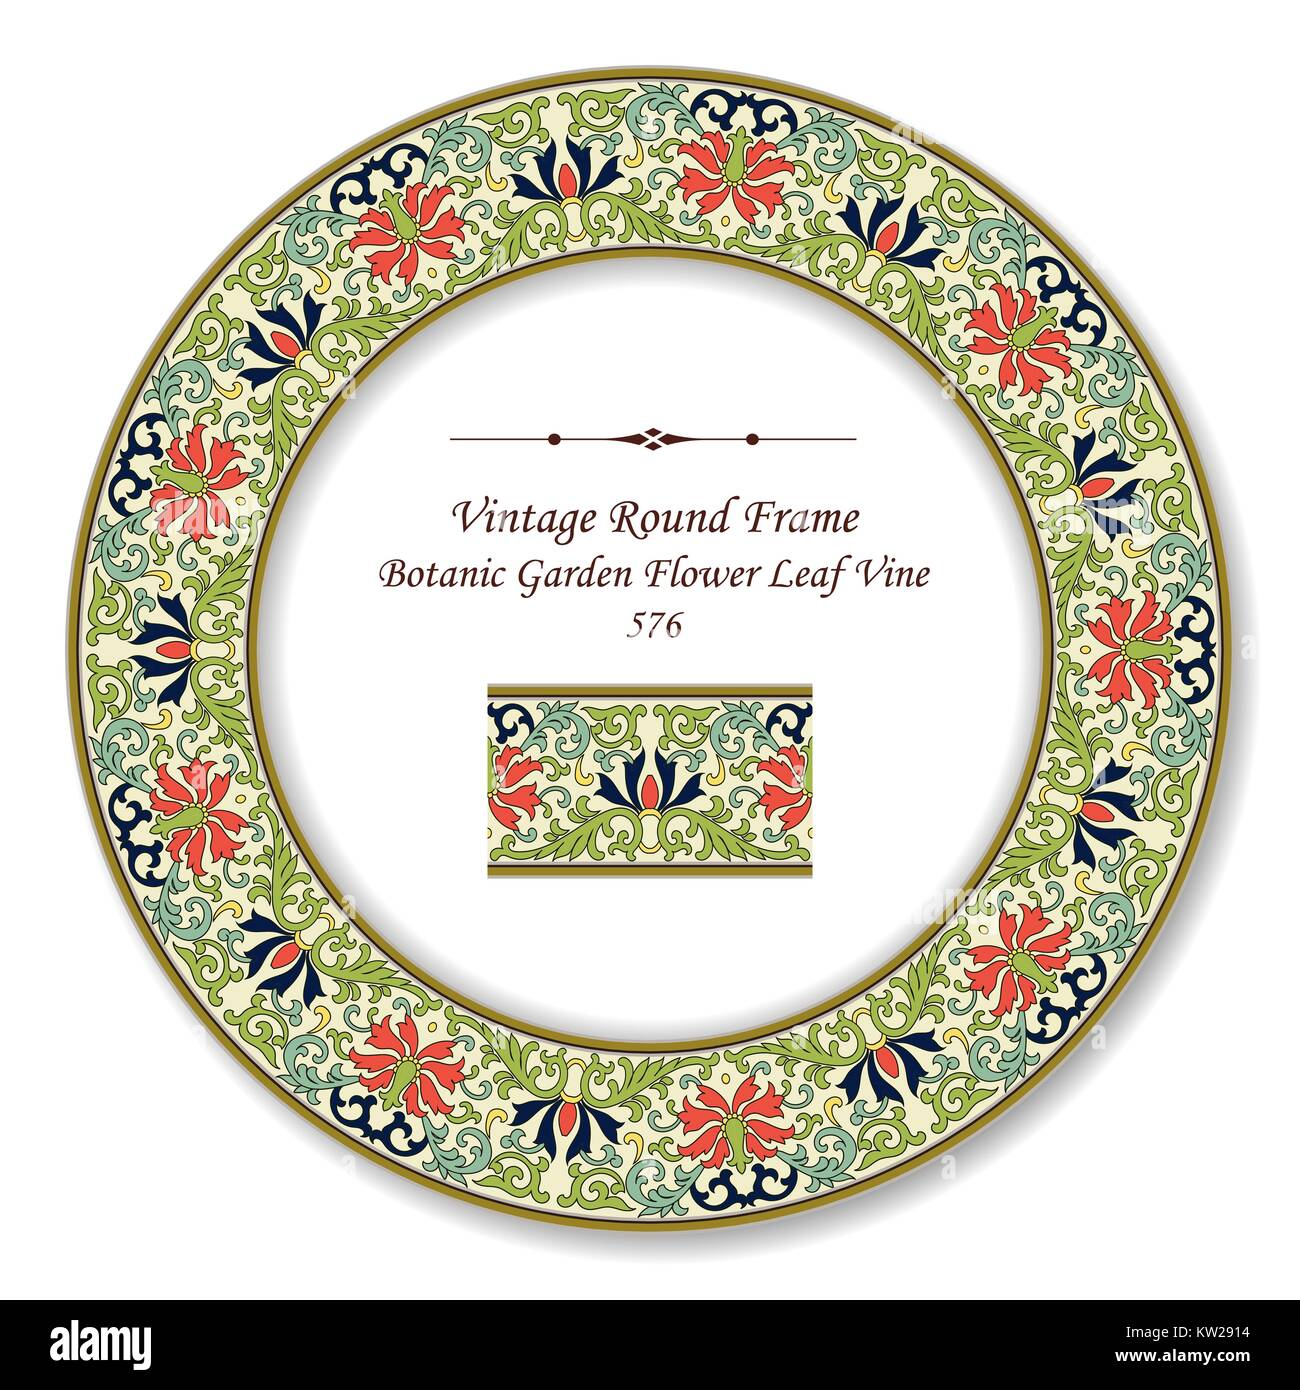 Vintage Round Retro Frame Botanic Garden Flower Leaf Vine Stock Vector